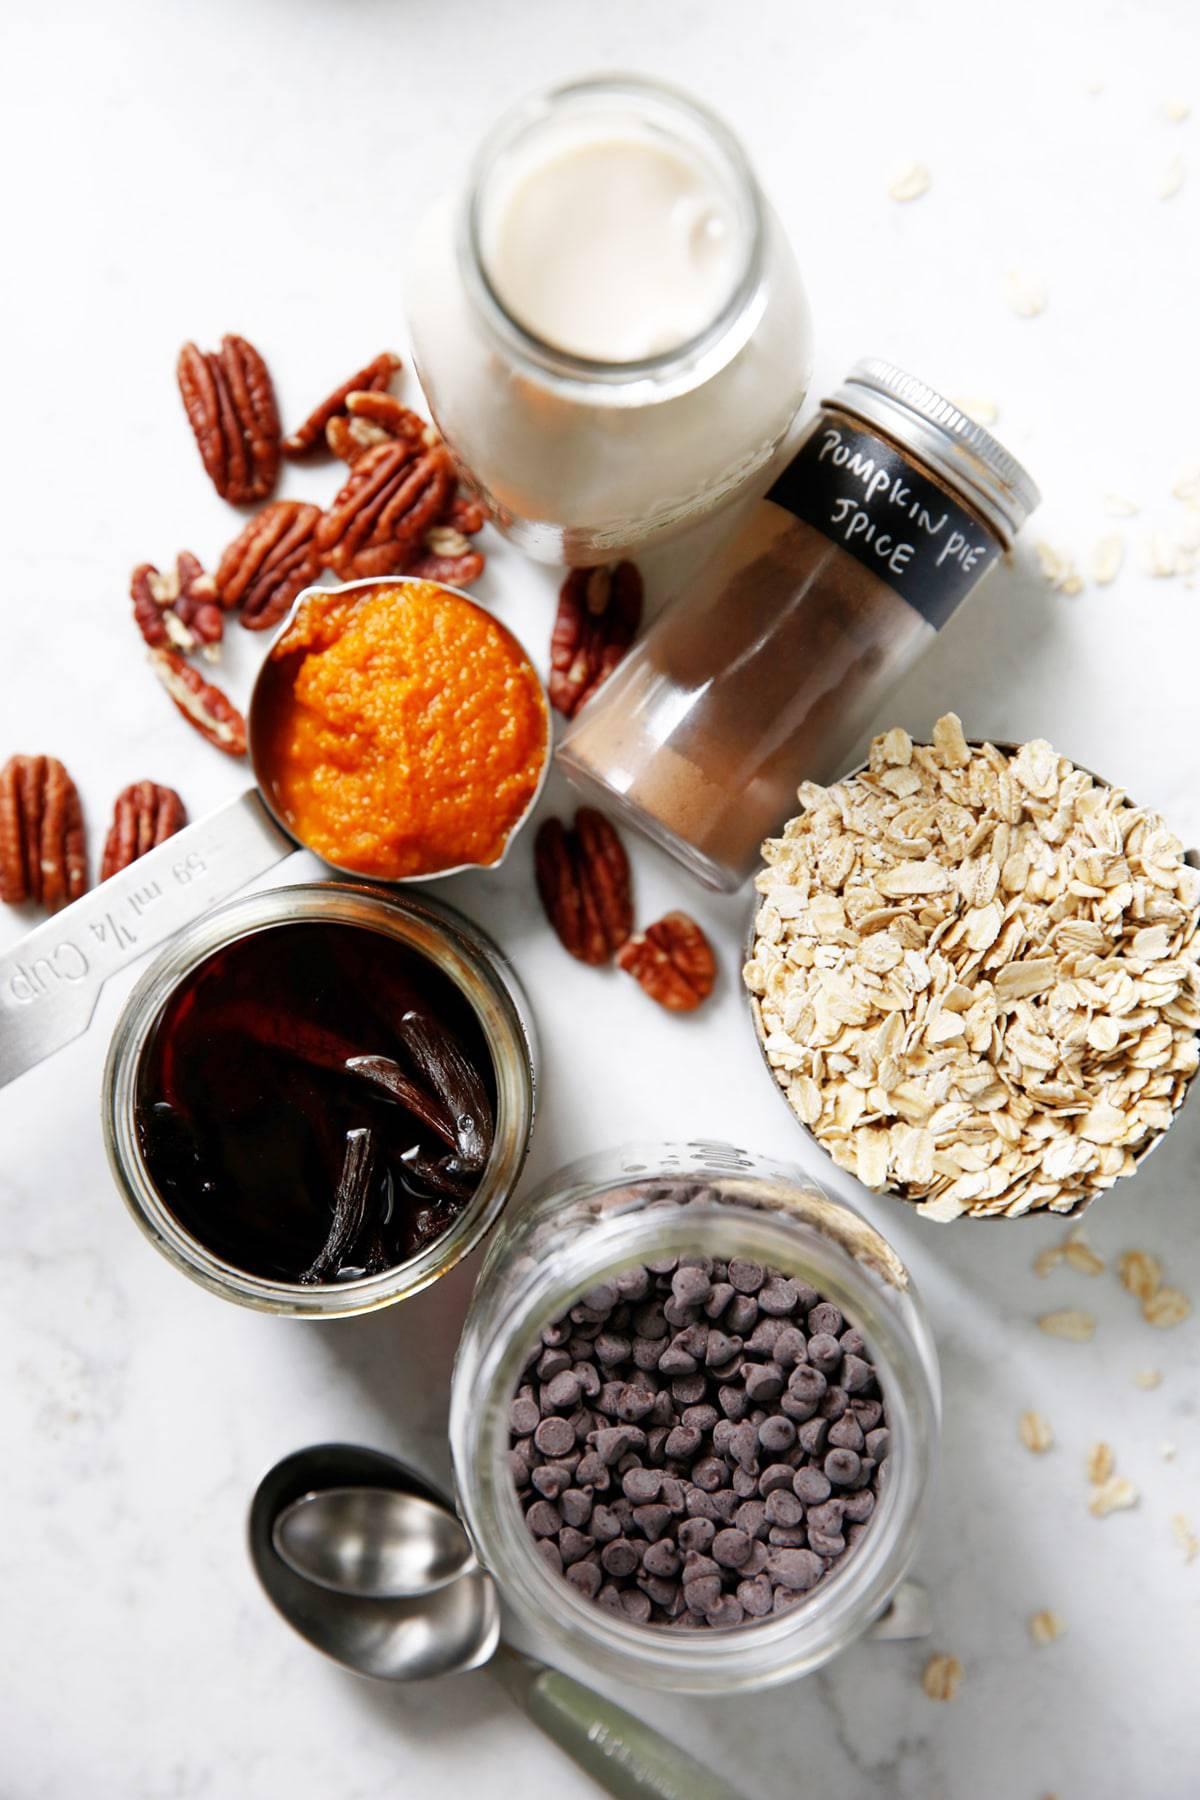 Ingredients for pumpkin overnight oats.